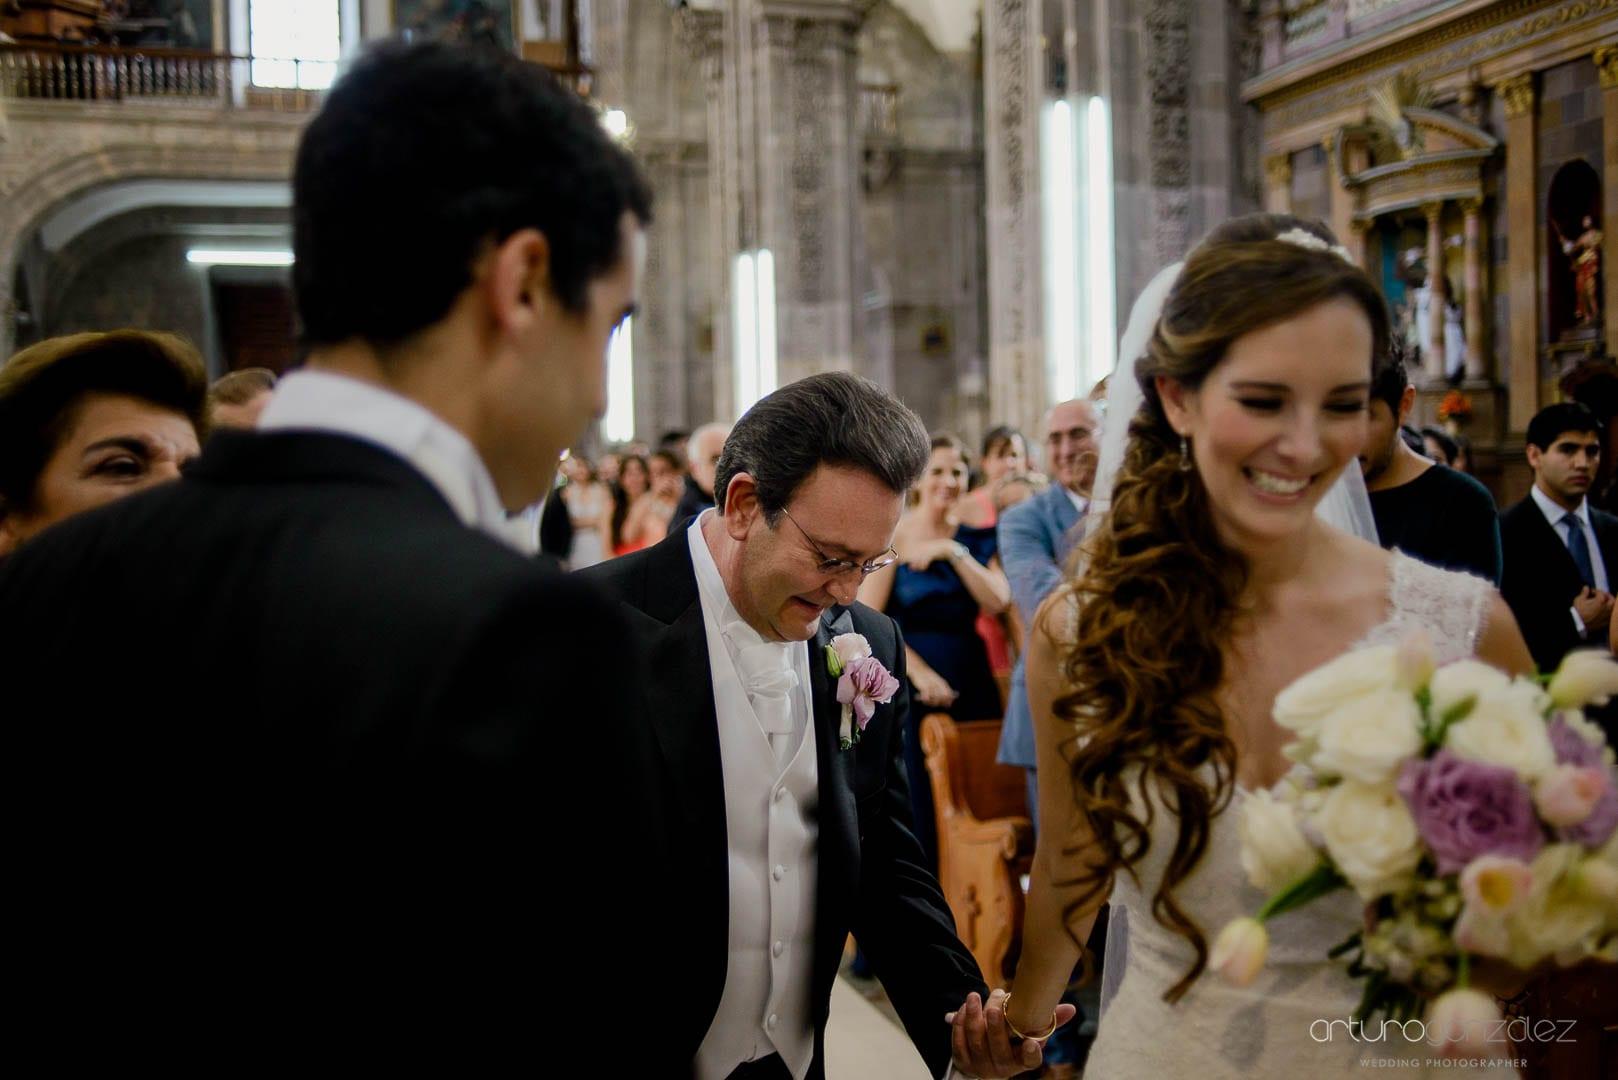 fotografo-de-bodas-en-guanajuato-66